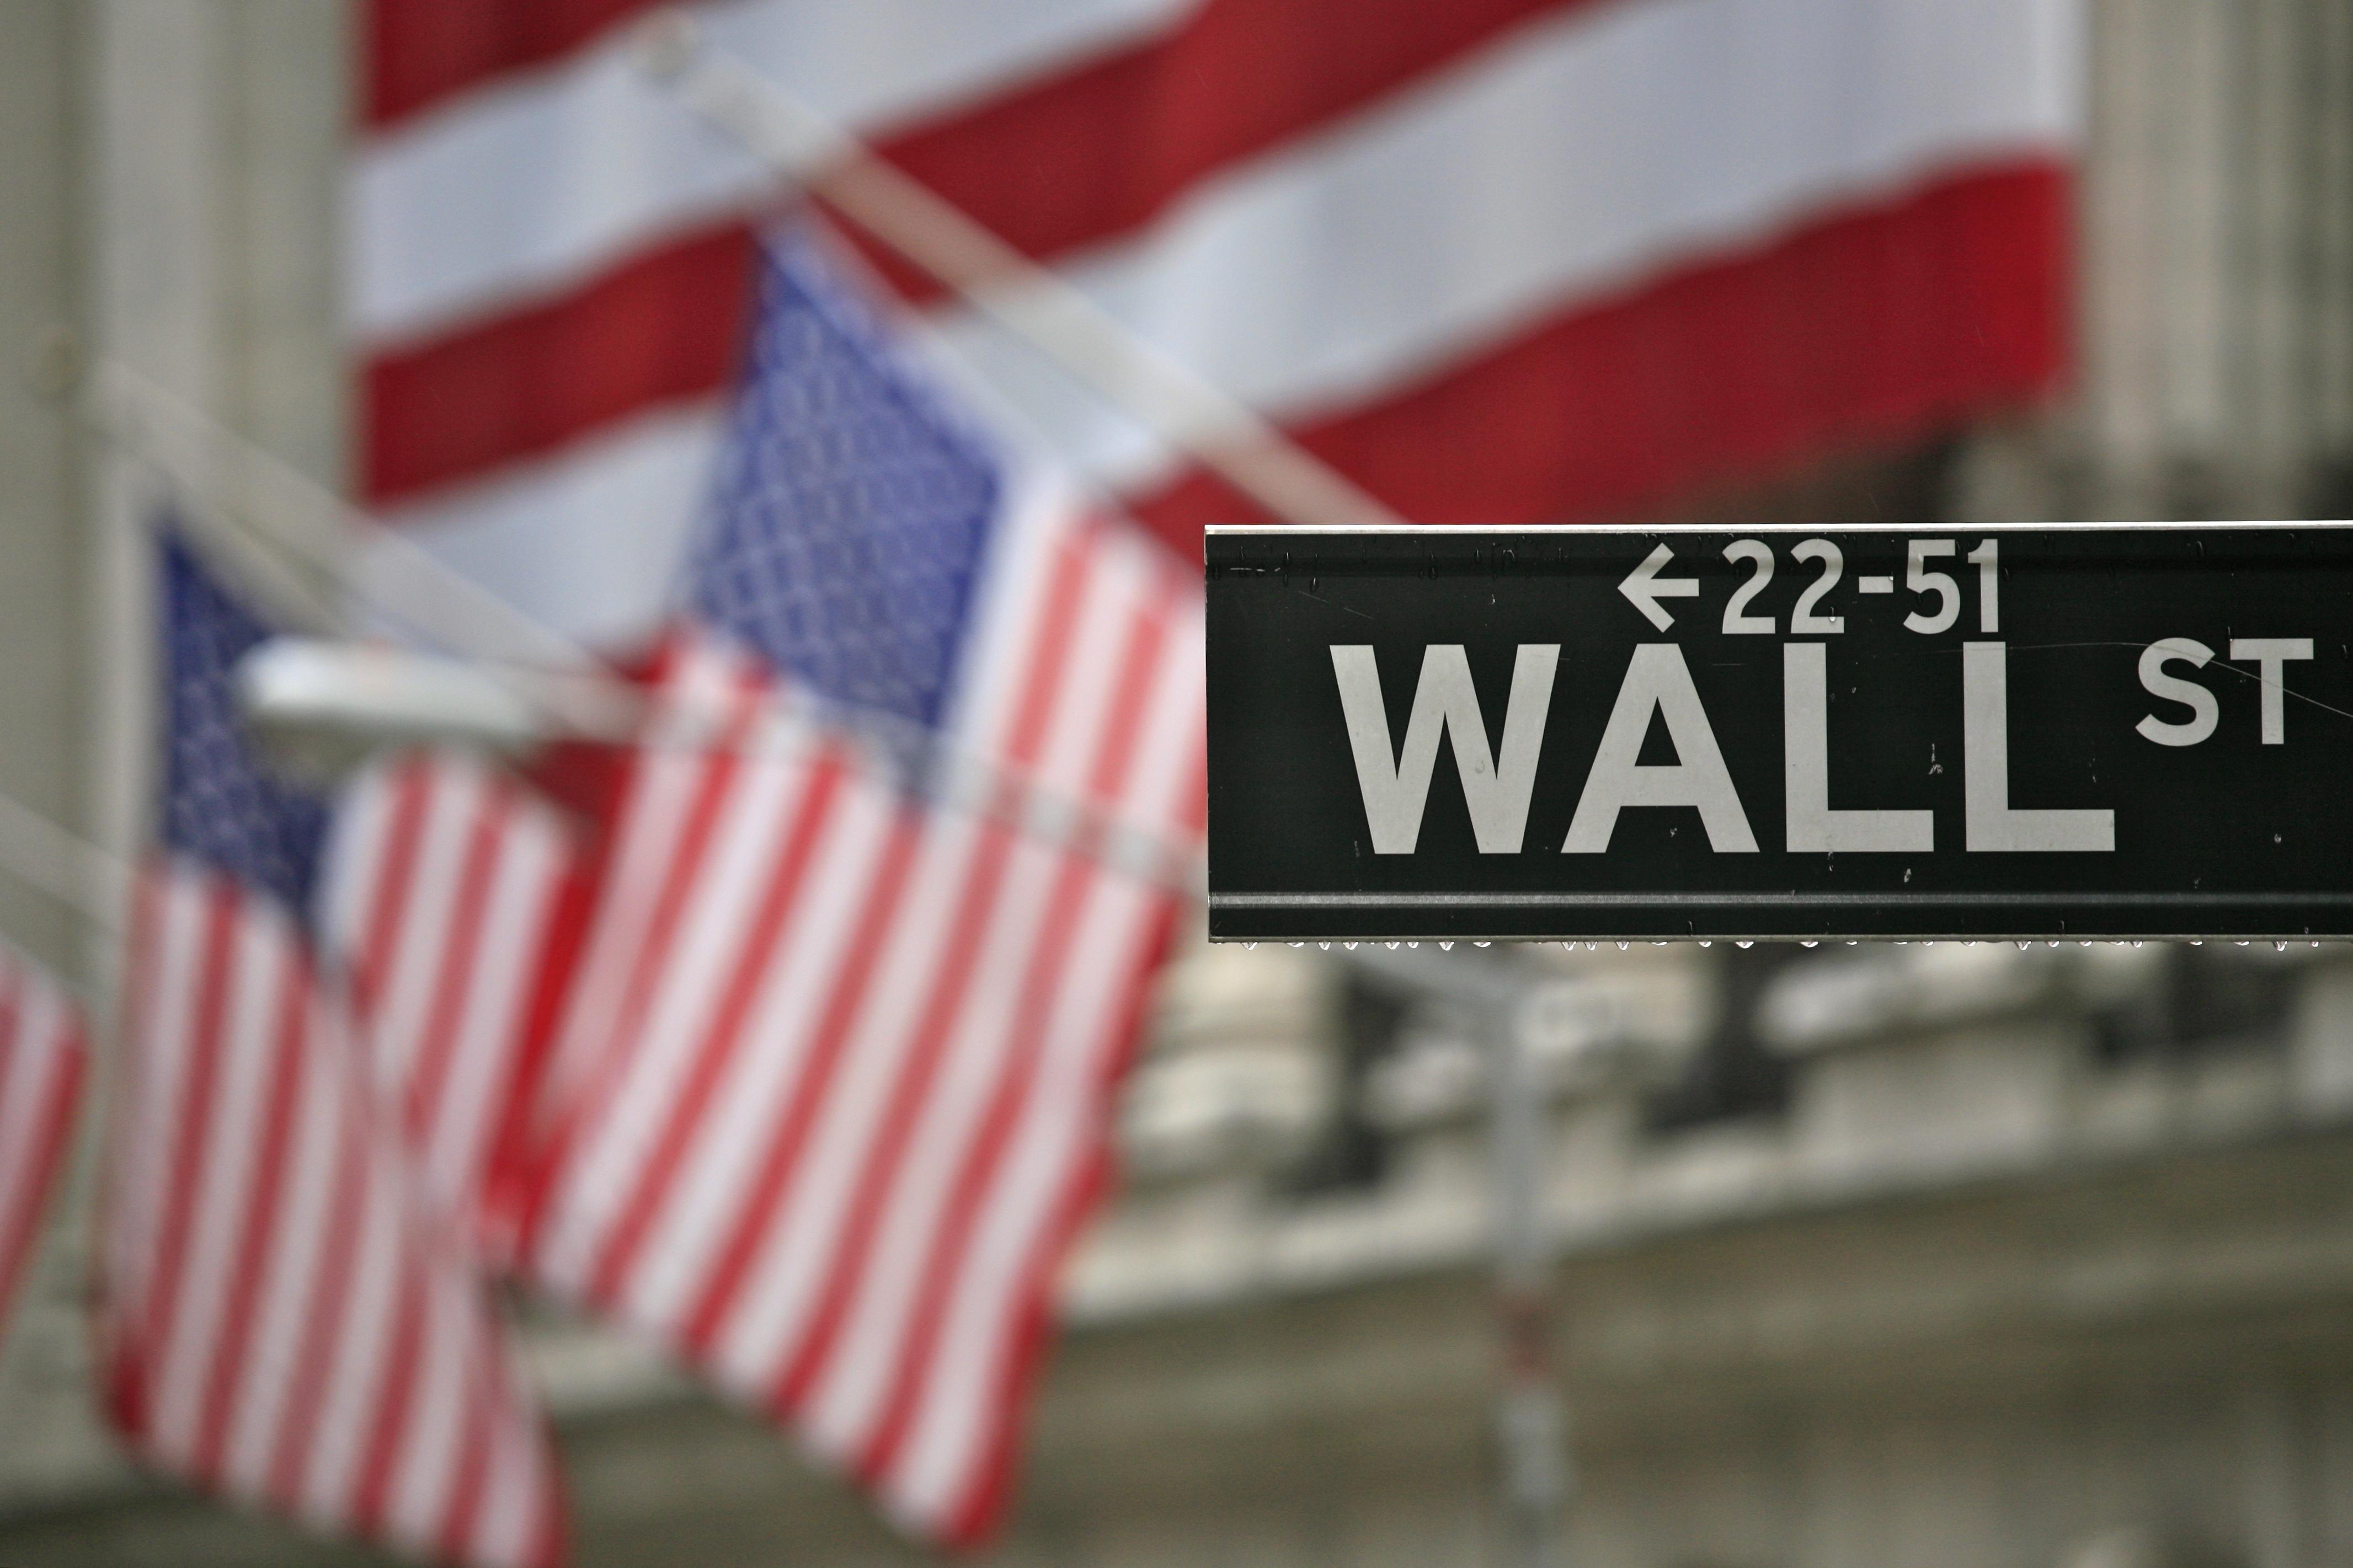 File:Wall Street (5899300483).jpg - Wikimedia Commons